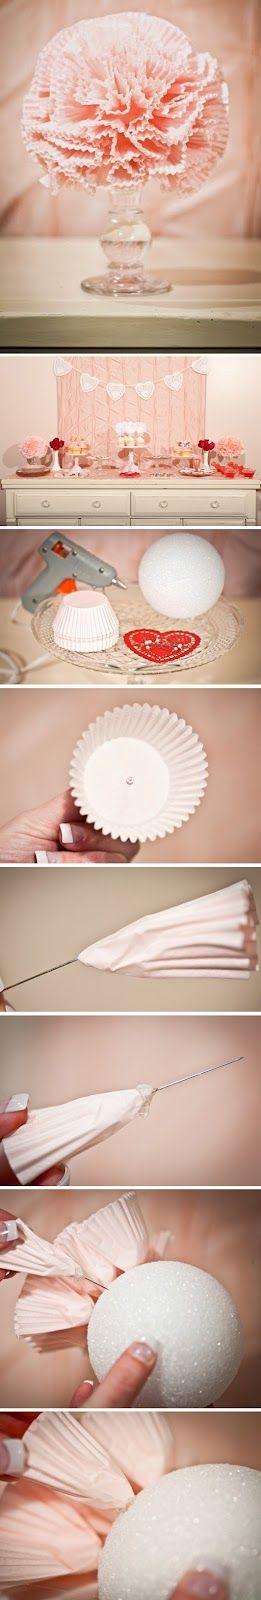 Cupcake Liner Pomander Tutorial